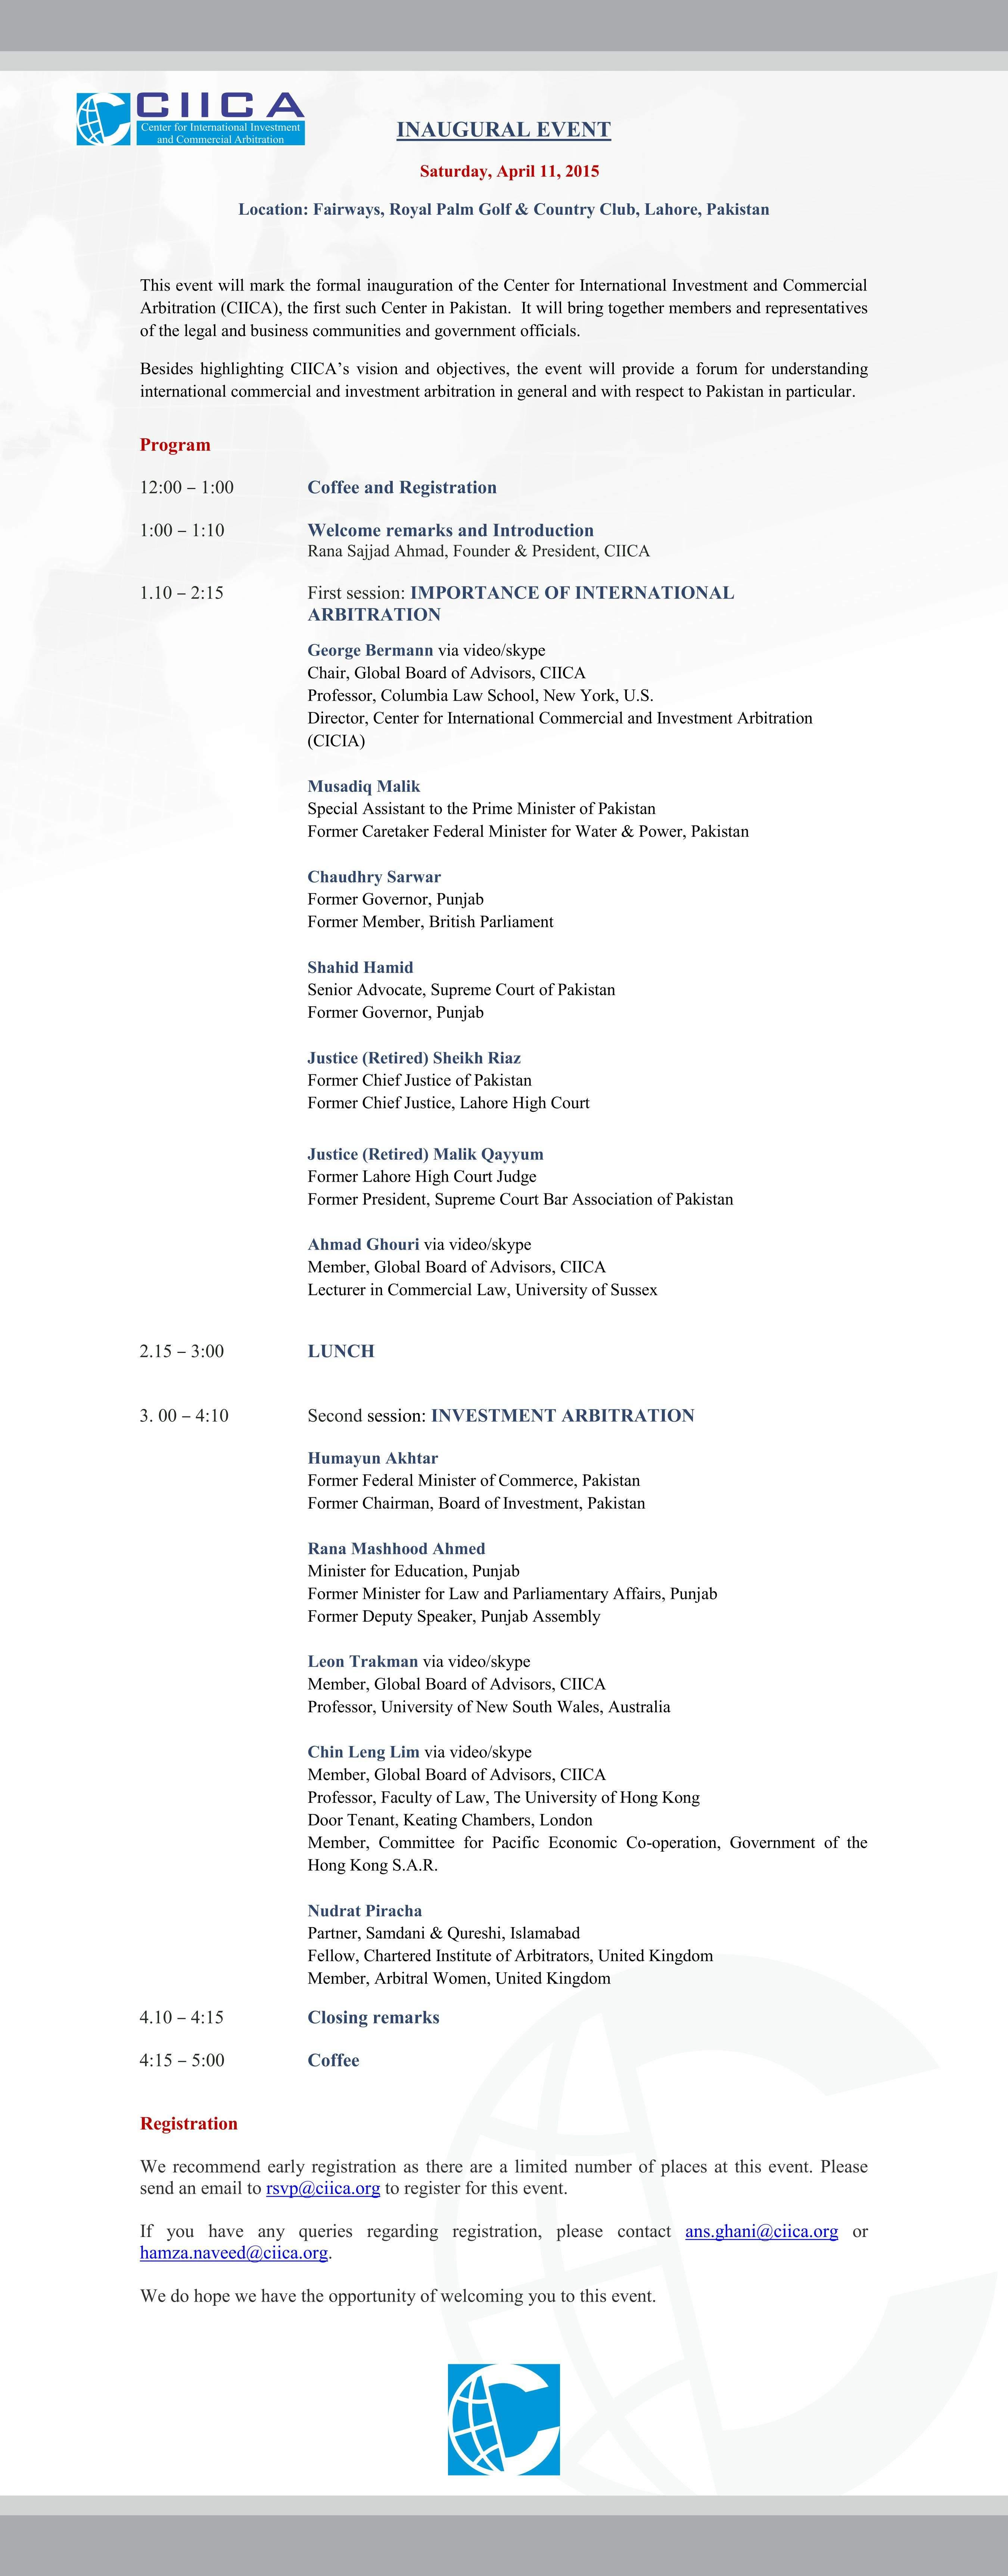 CIICA - Inaugural event program (April 11, 2015) Final